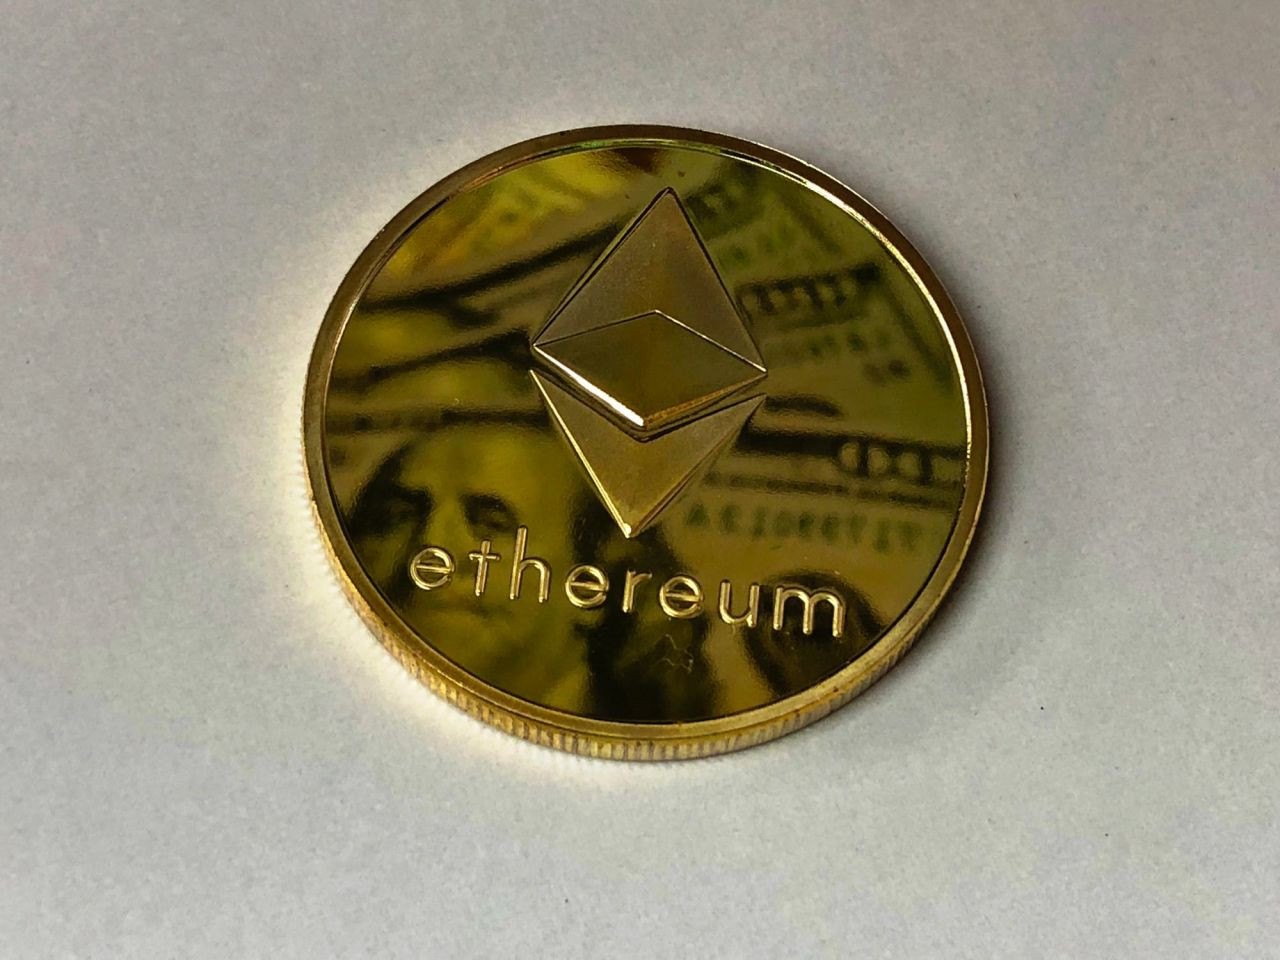 Binance CEO'su Changpeng Zhao: Bitcoin'i kimse kapatamaz - Sayfa 2